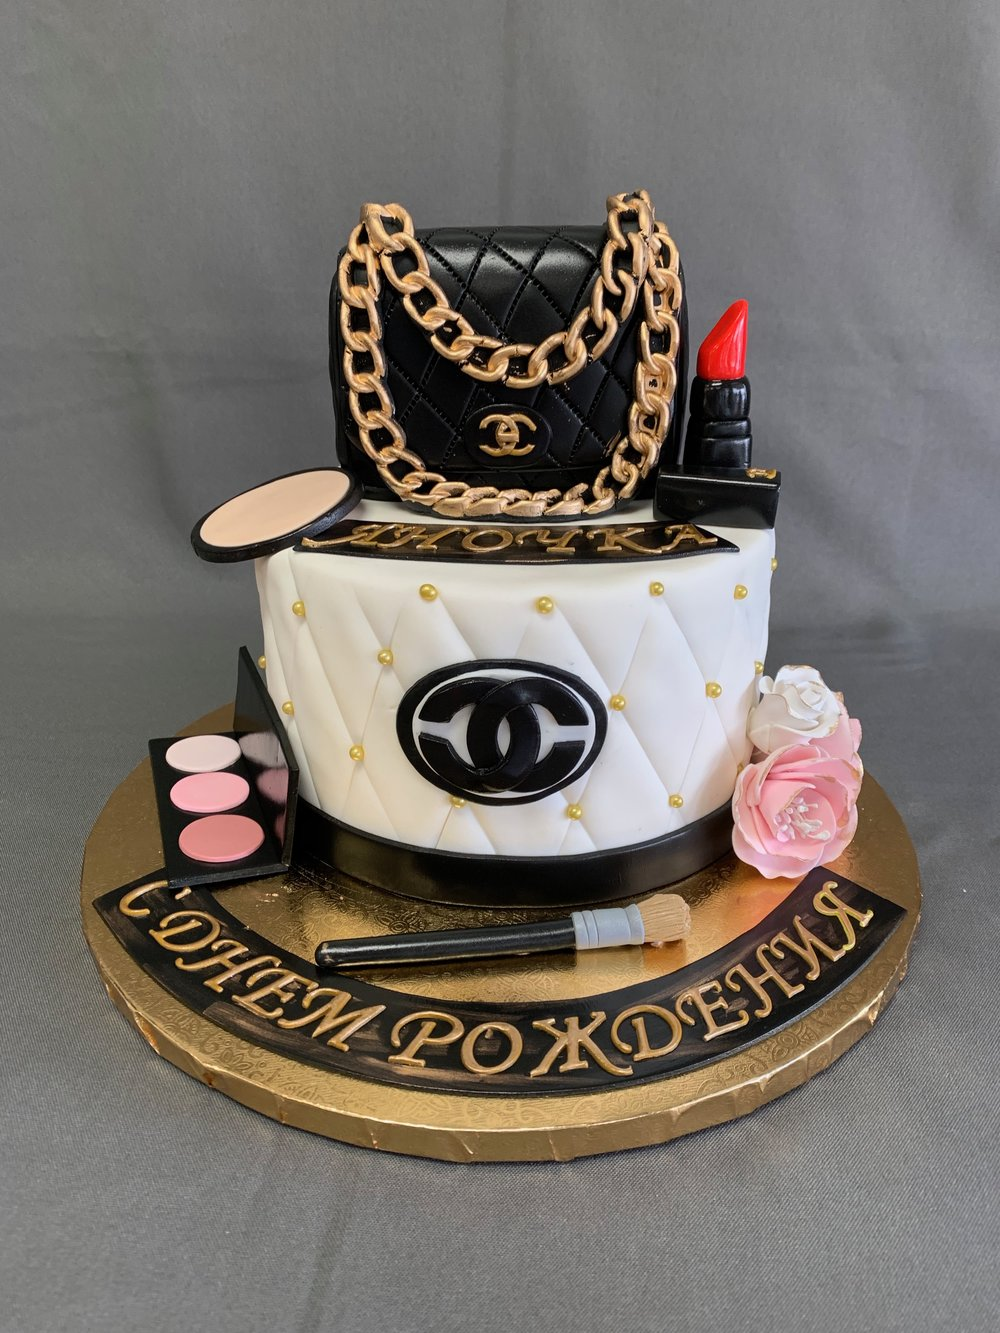 Chanel themed Birthday cake NJ